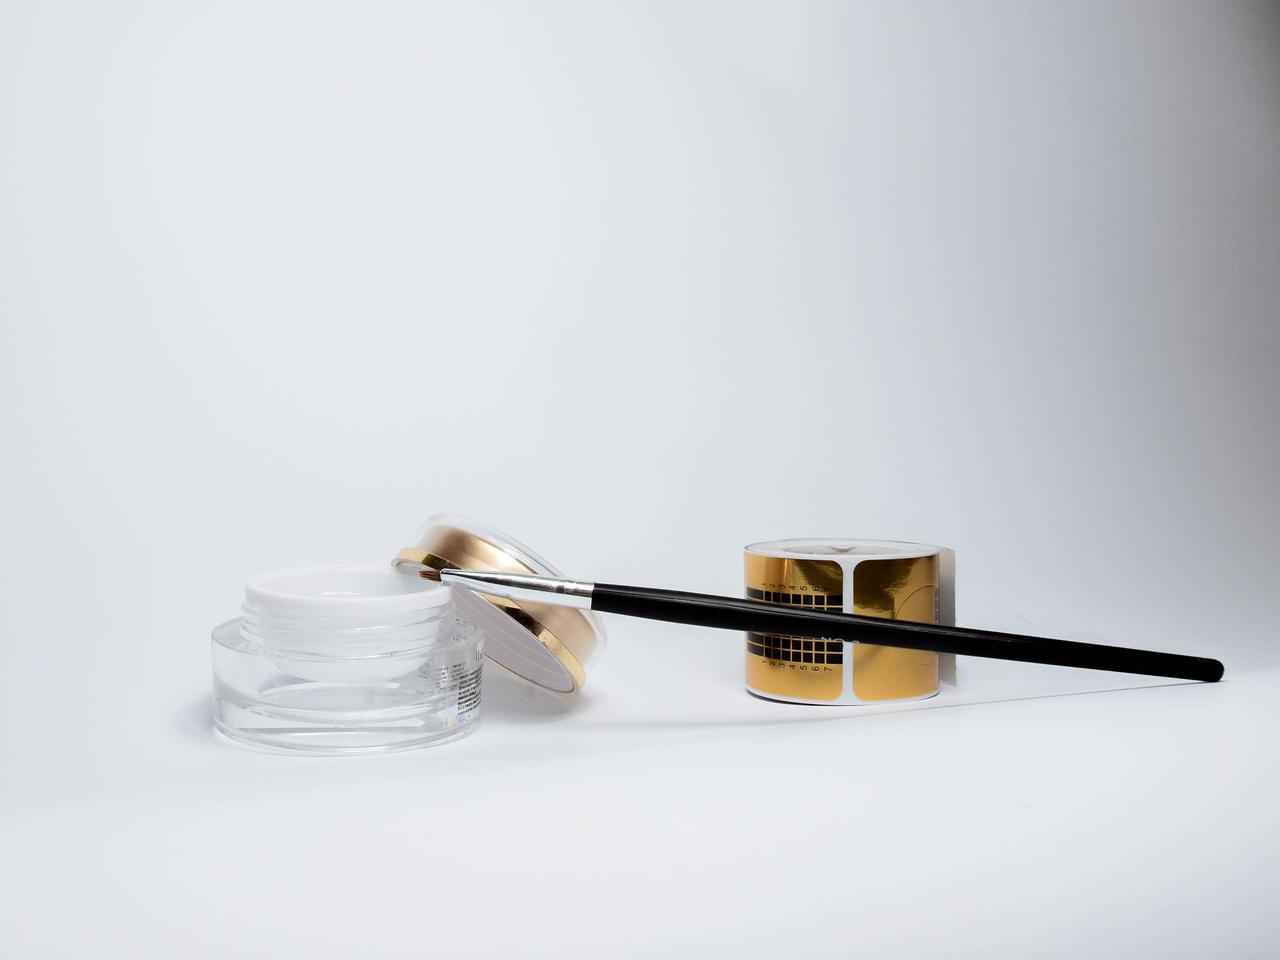 brush-close-up-cosmetics-414729.jpg